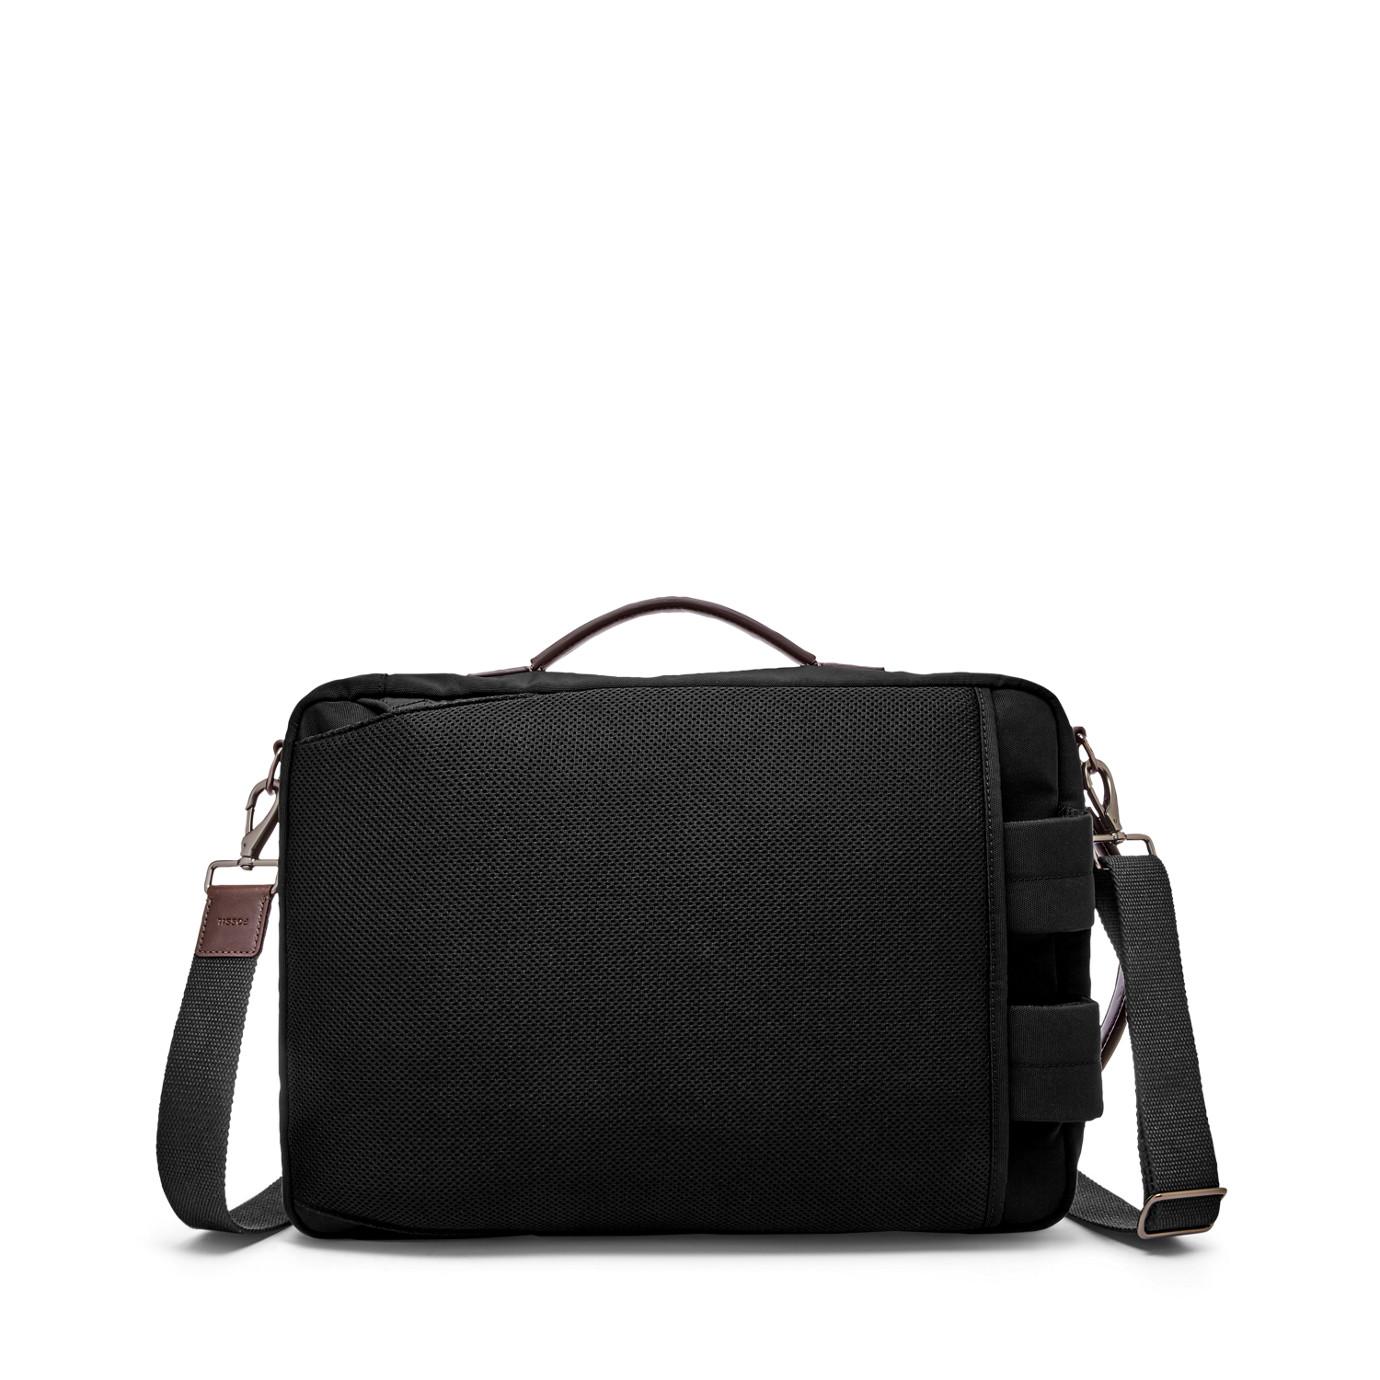 Buckner Convertible Backpack